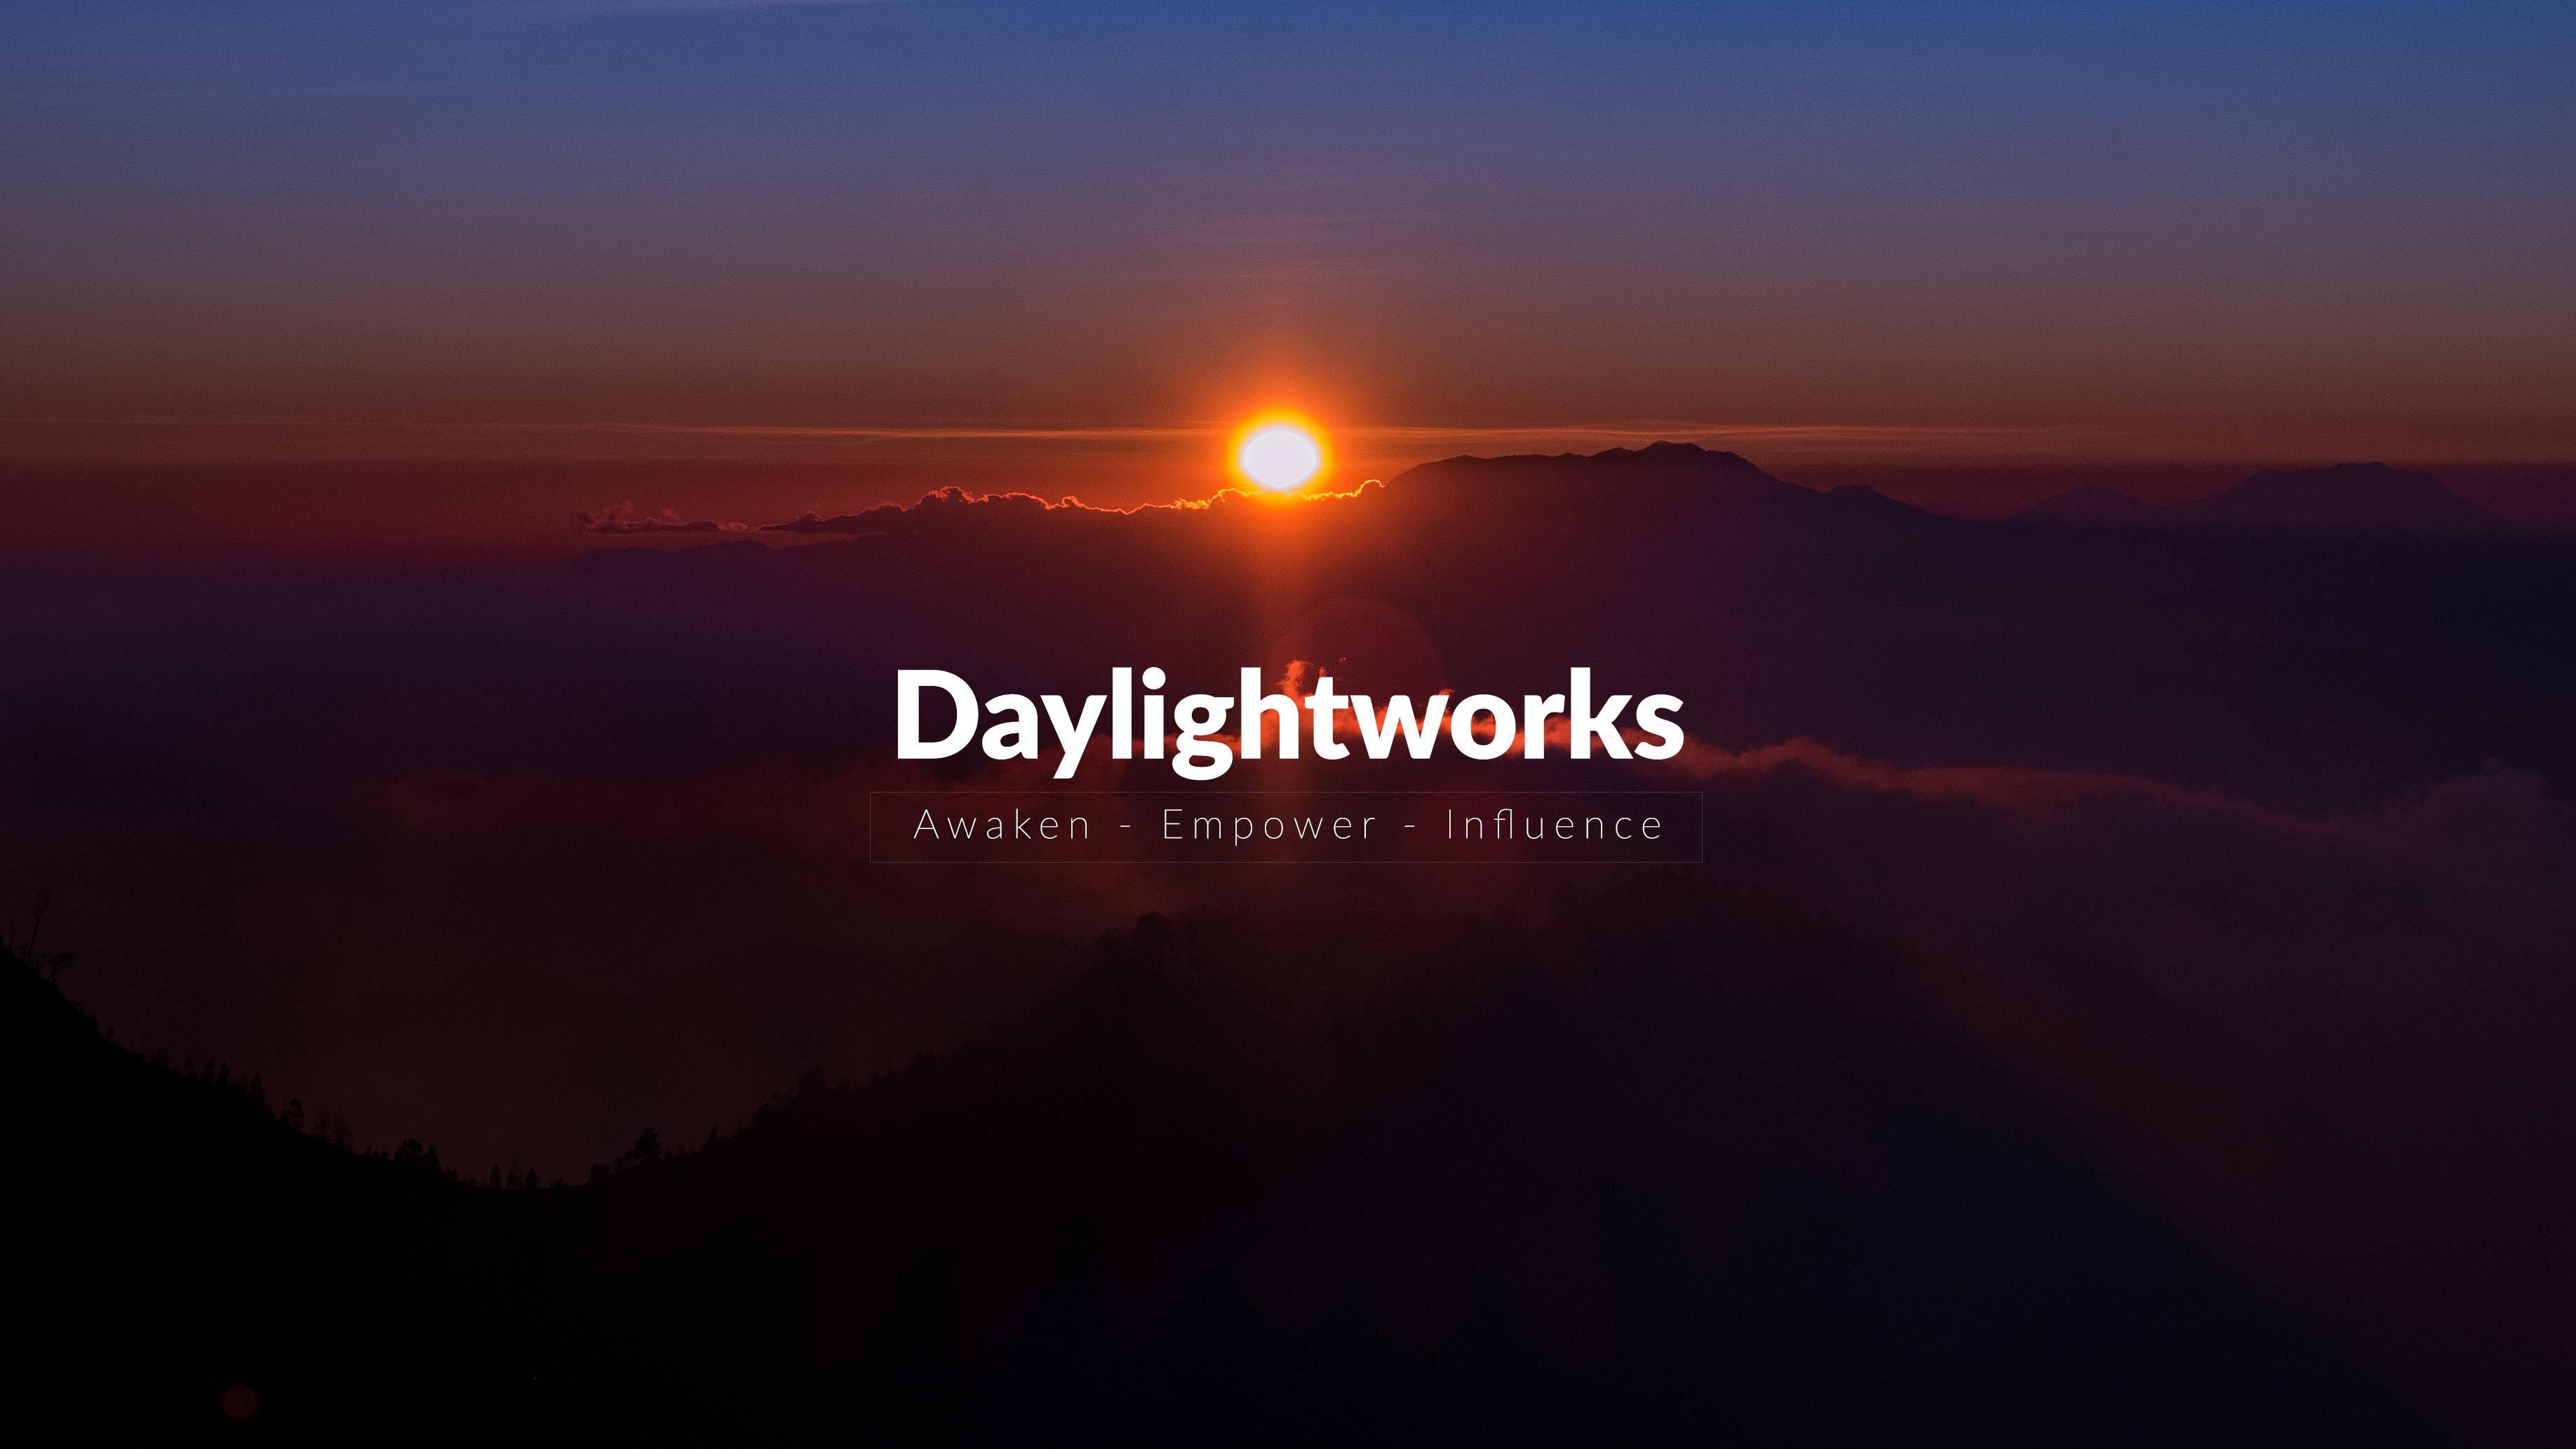 Daylightworks